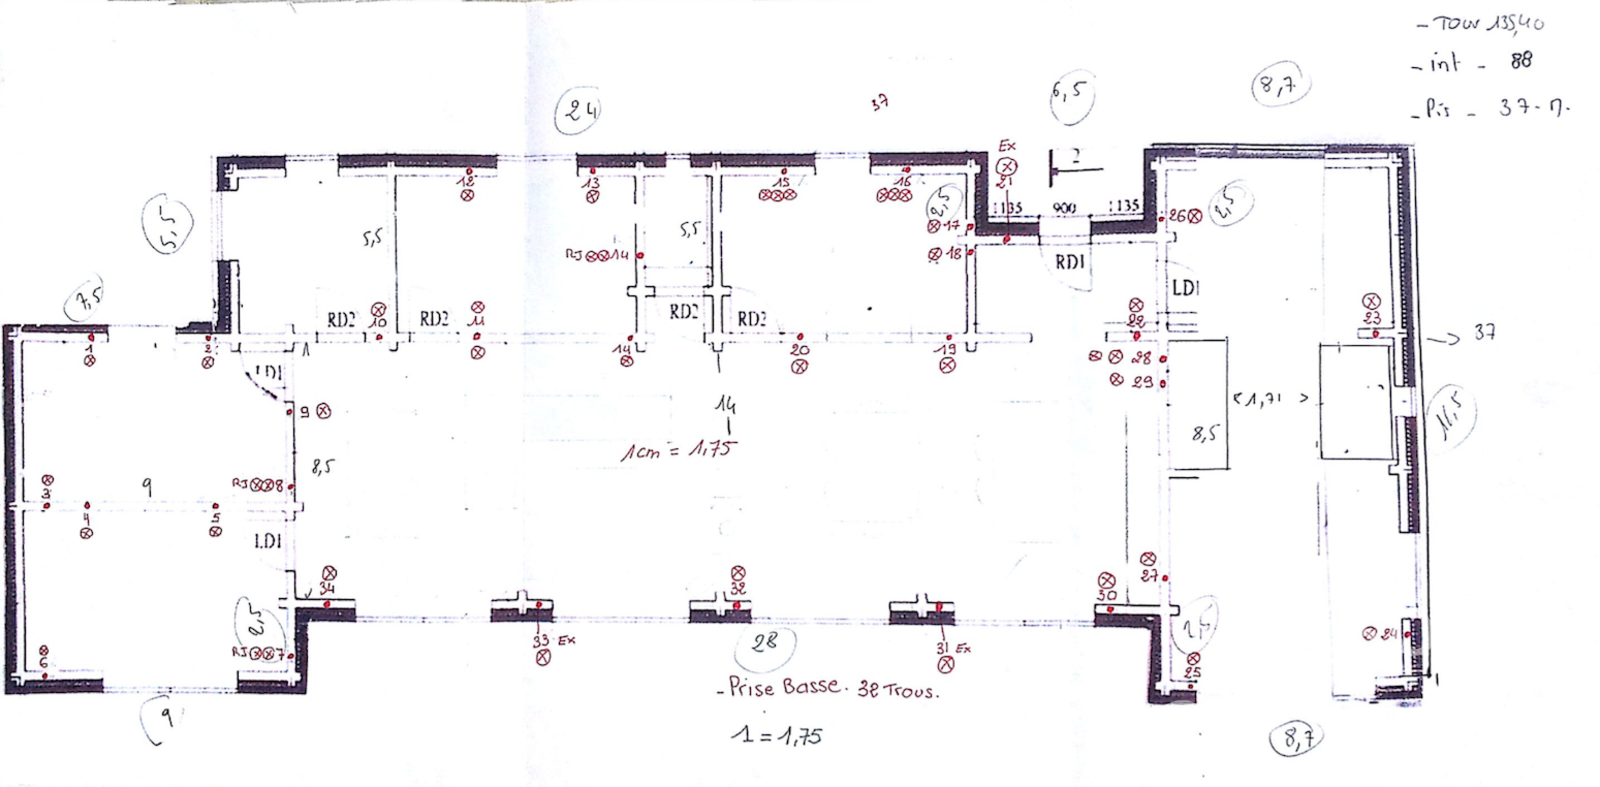 Electricityplan 04